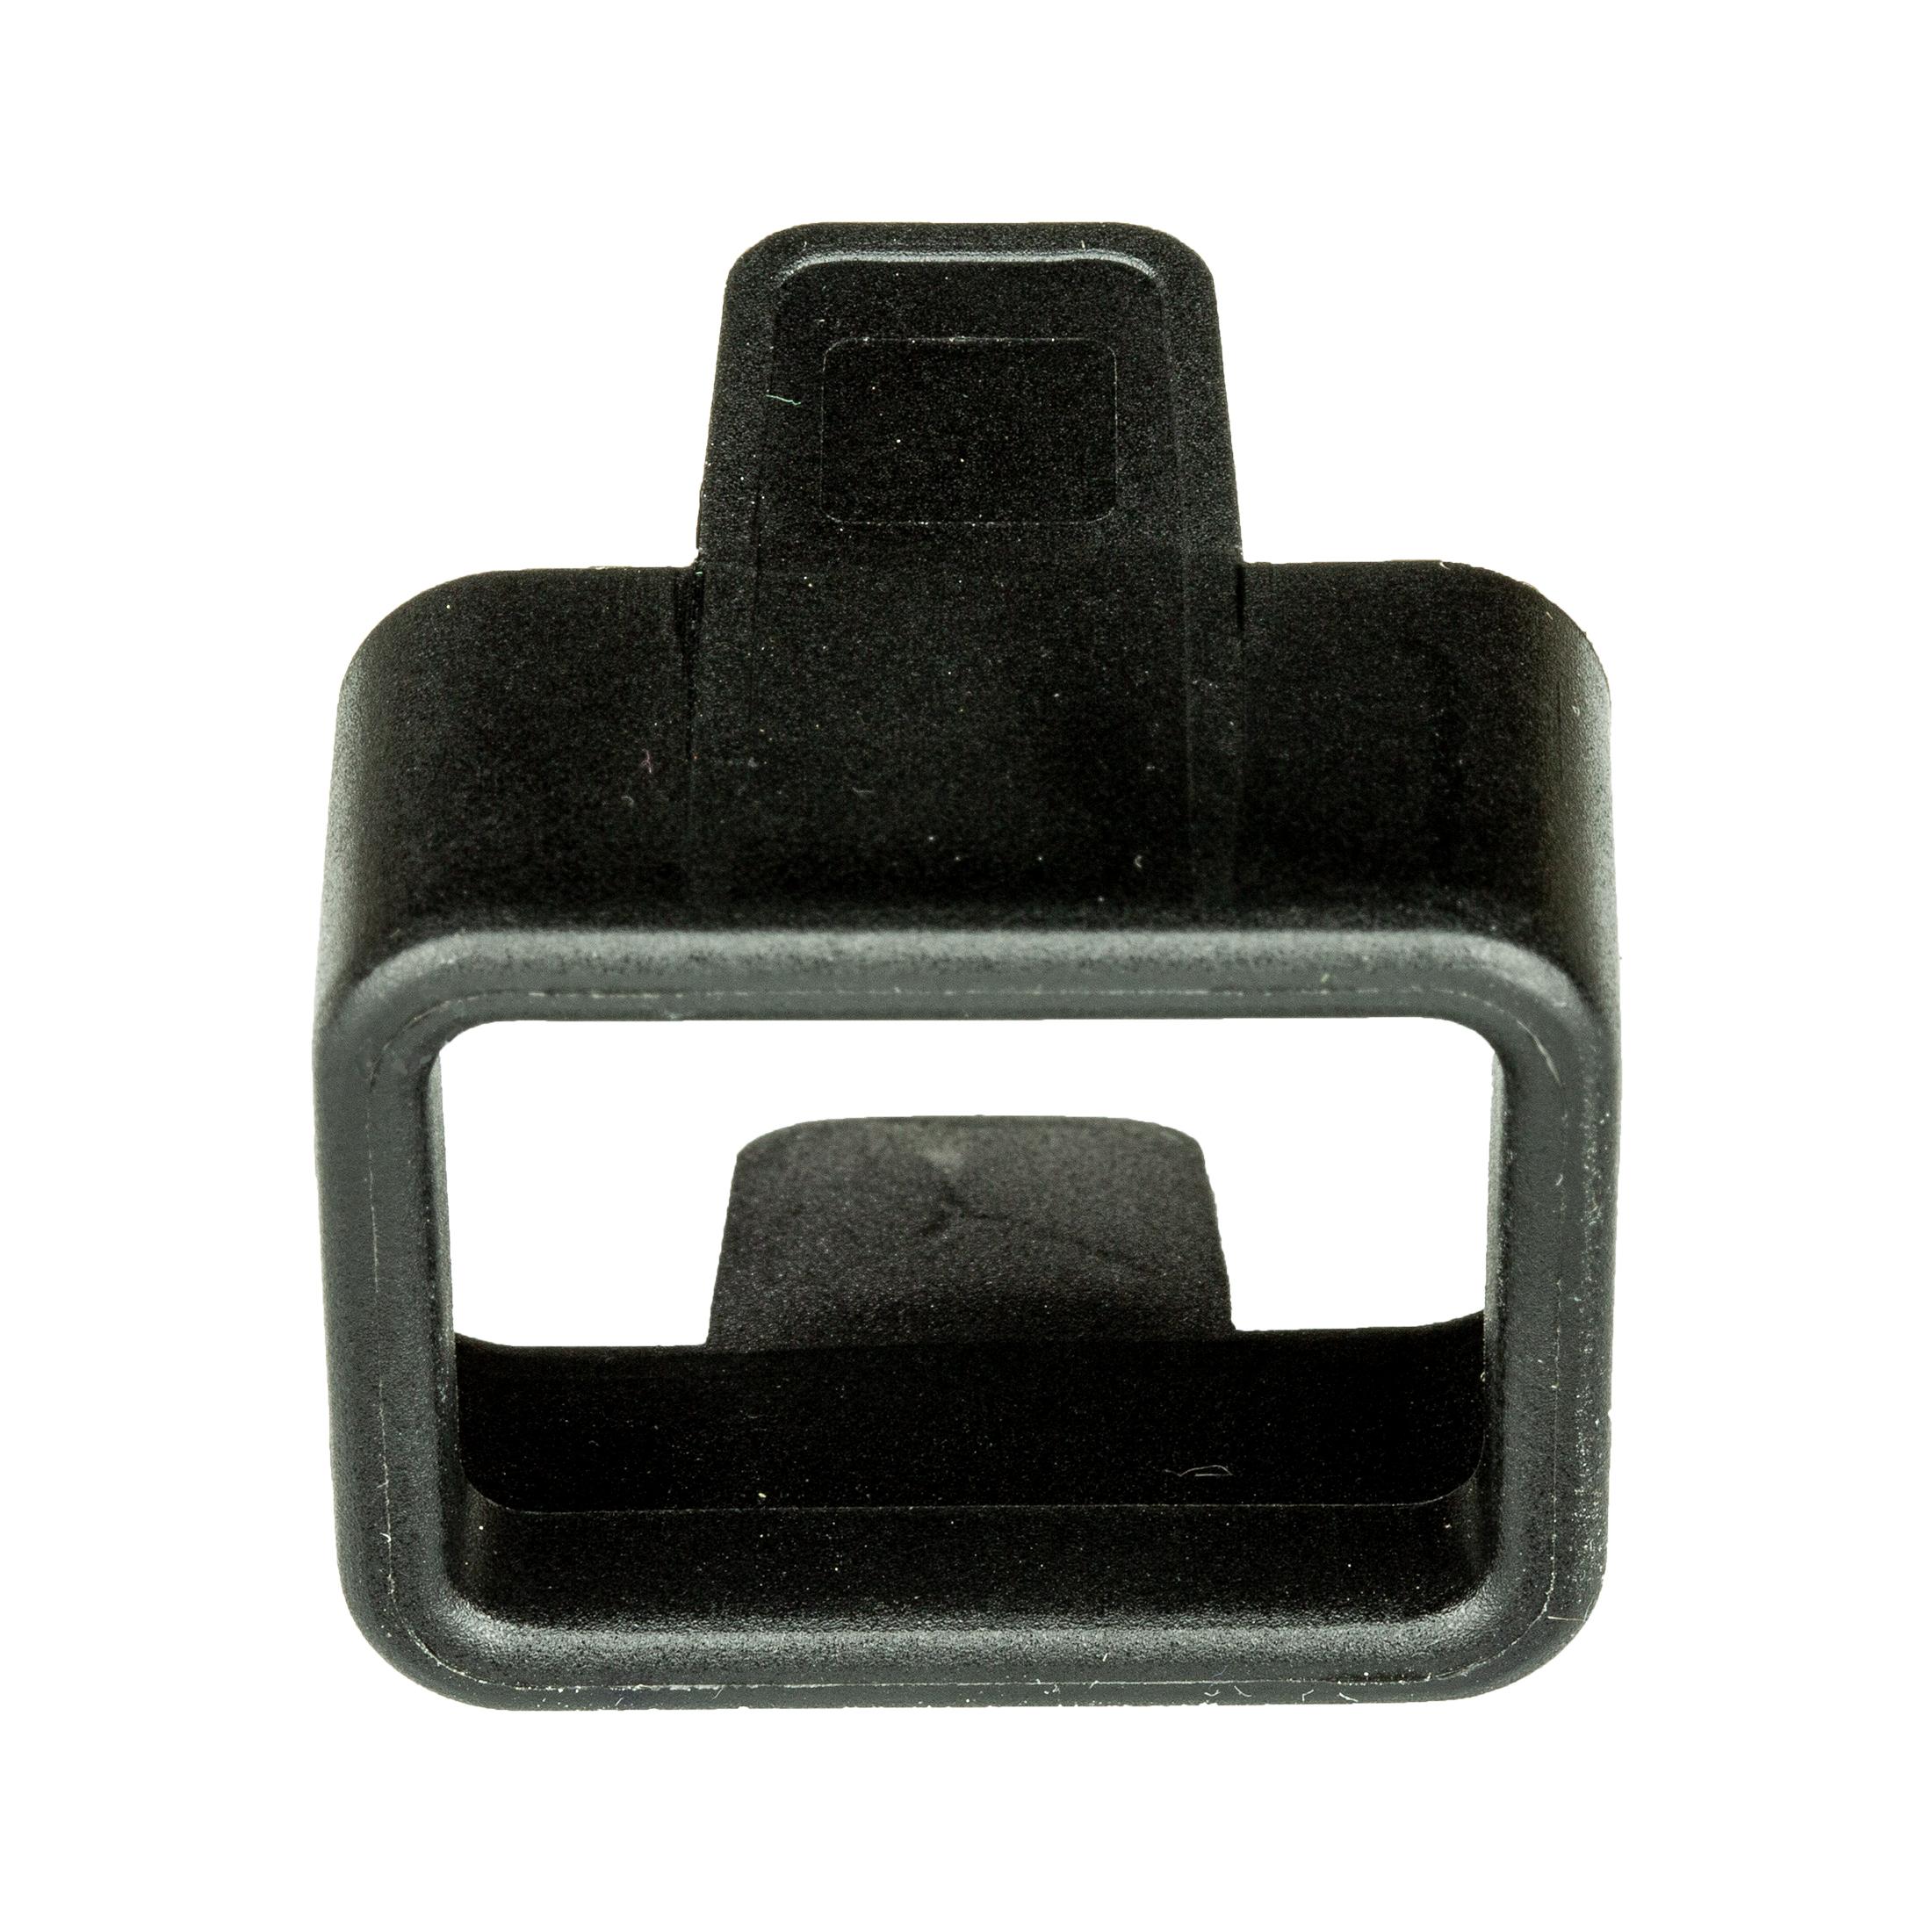 Secure-Fit Sleeves IEC60320 C13 C14 C15 C19 C20 C21